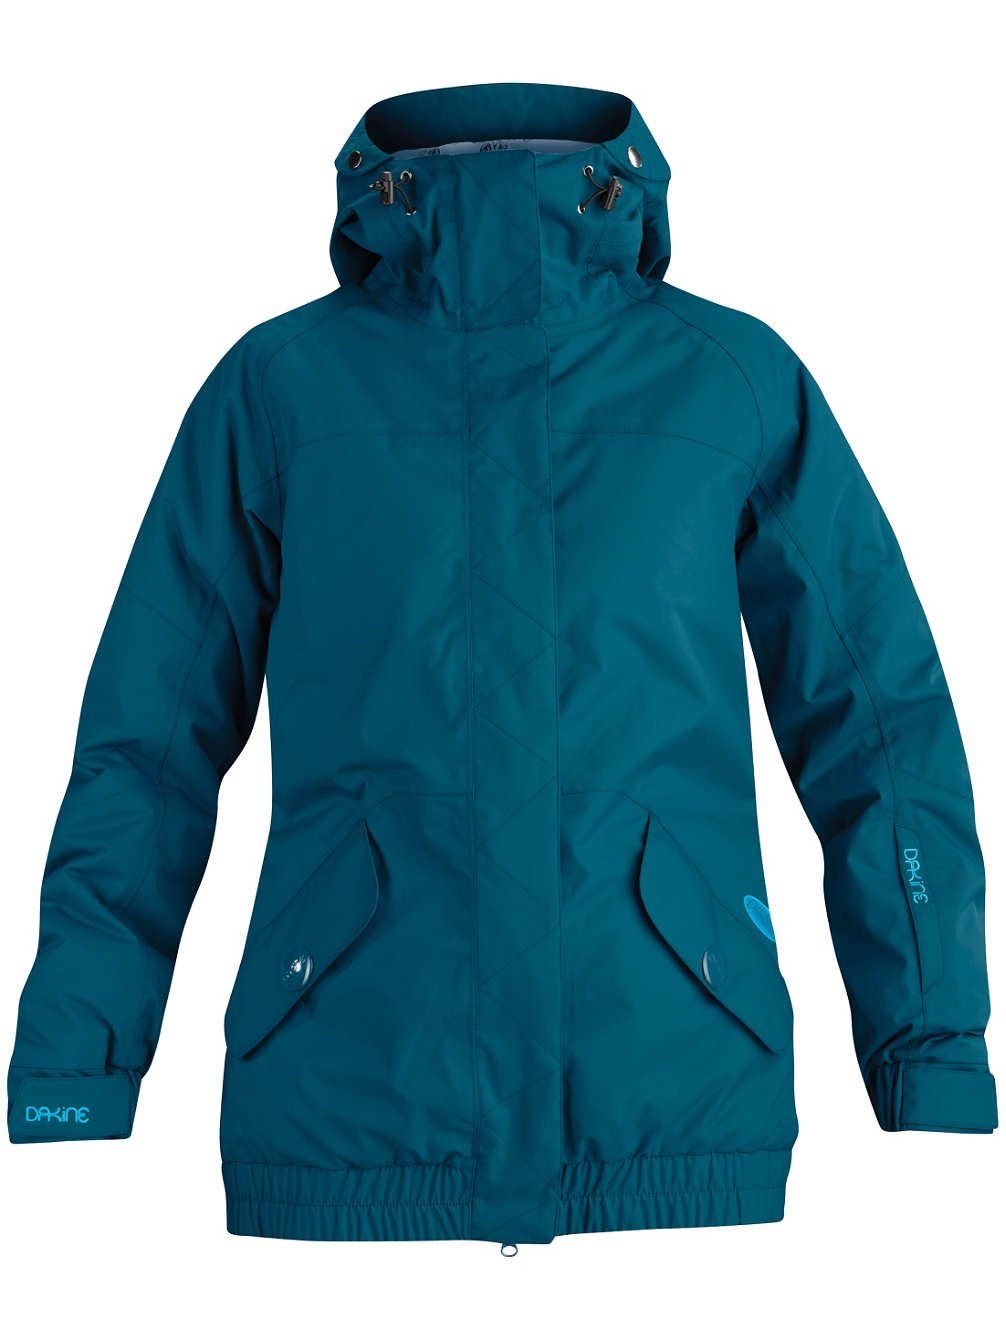 Damen Snowboard Jacke Dakine Hayley Jacket jetzt bestellen